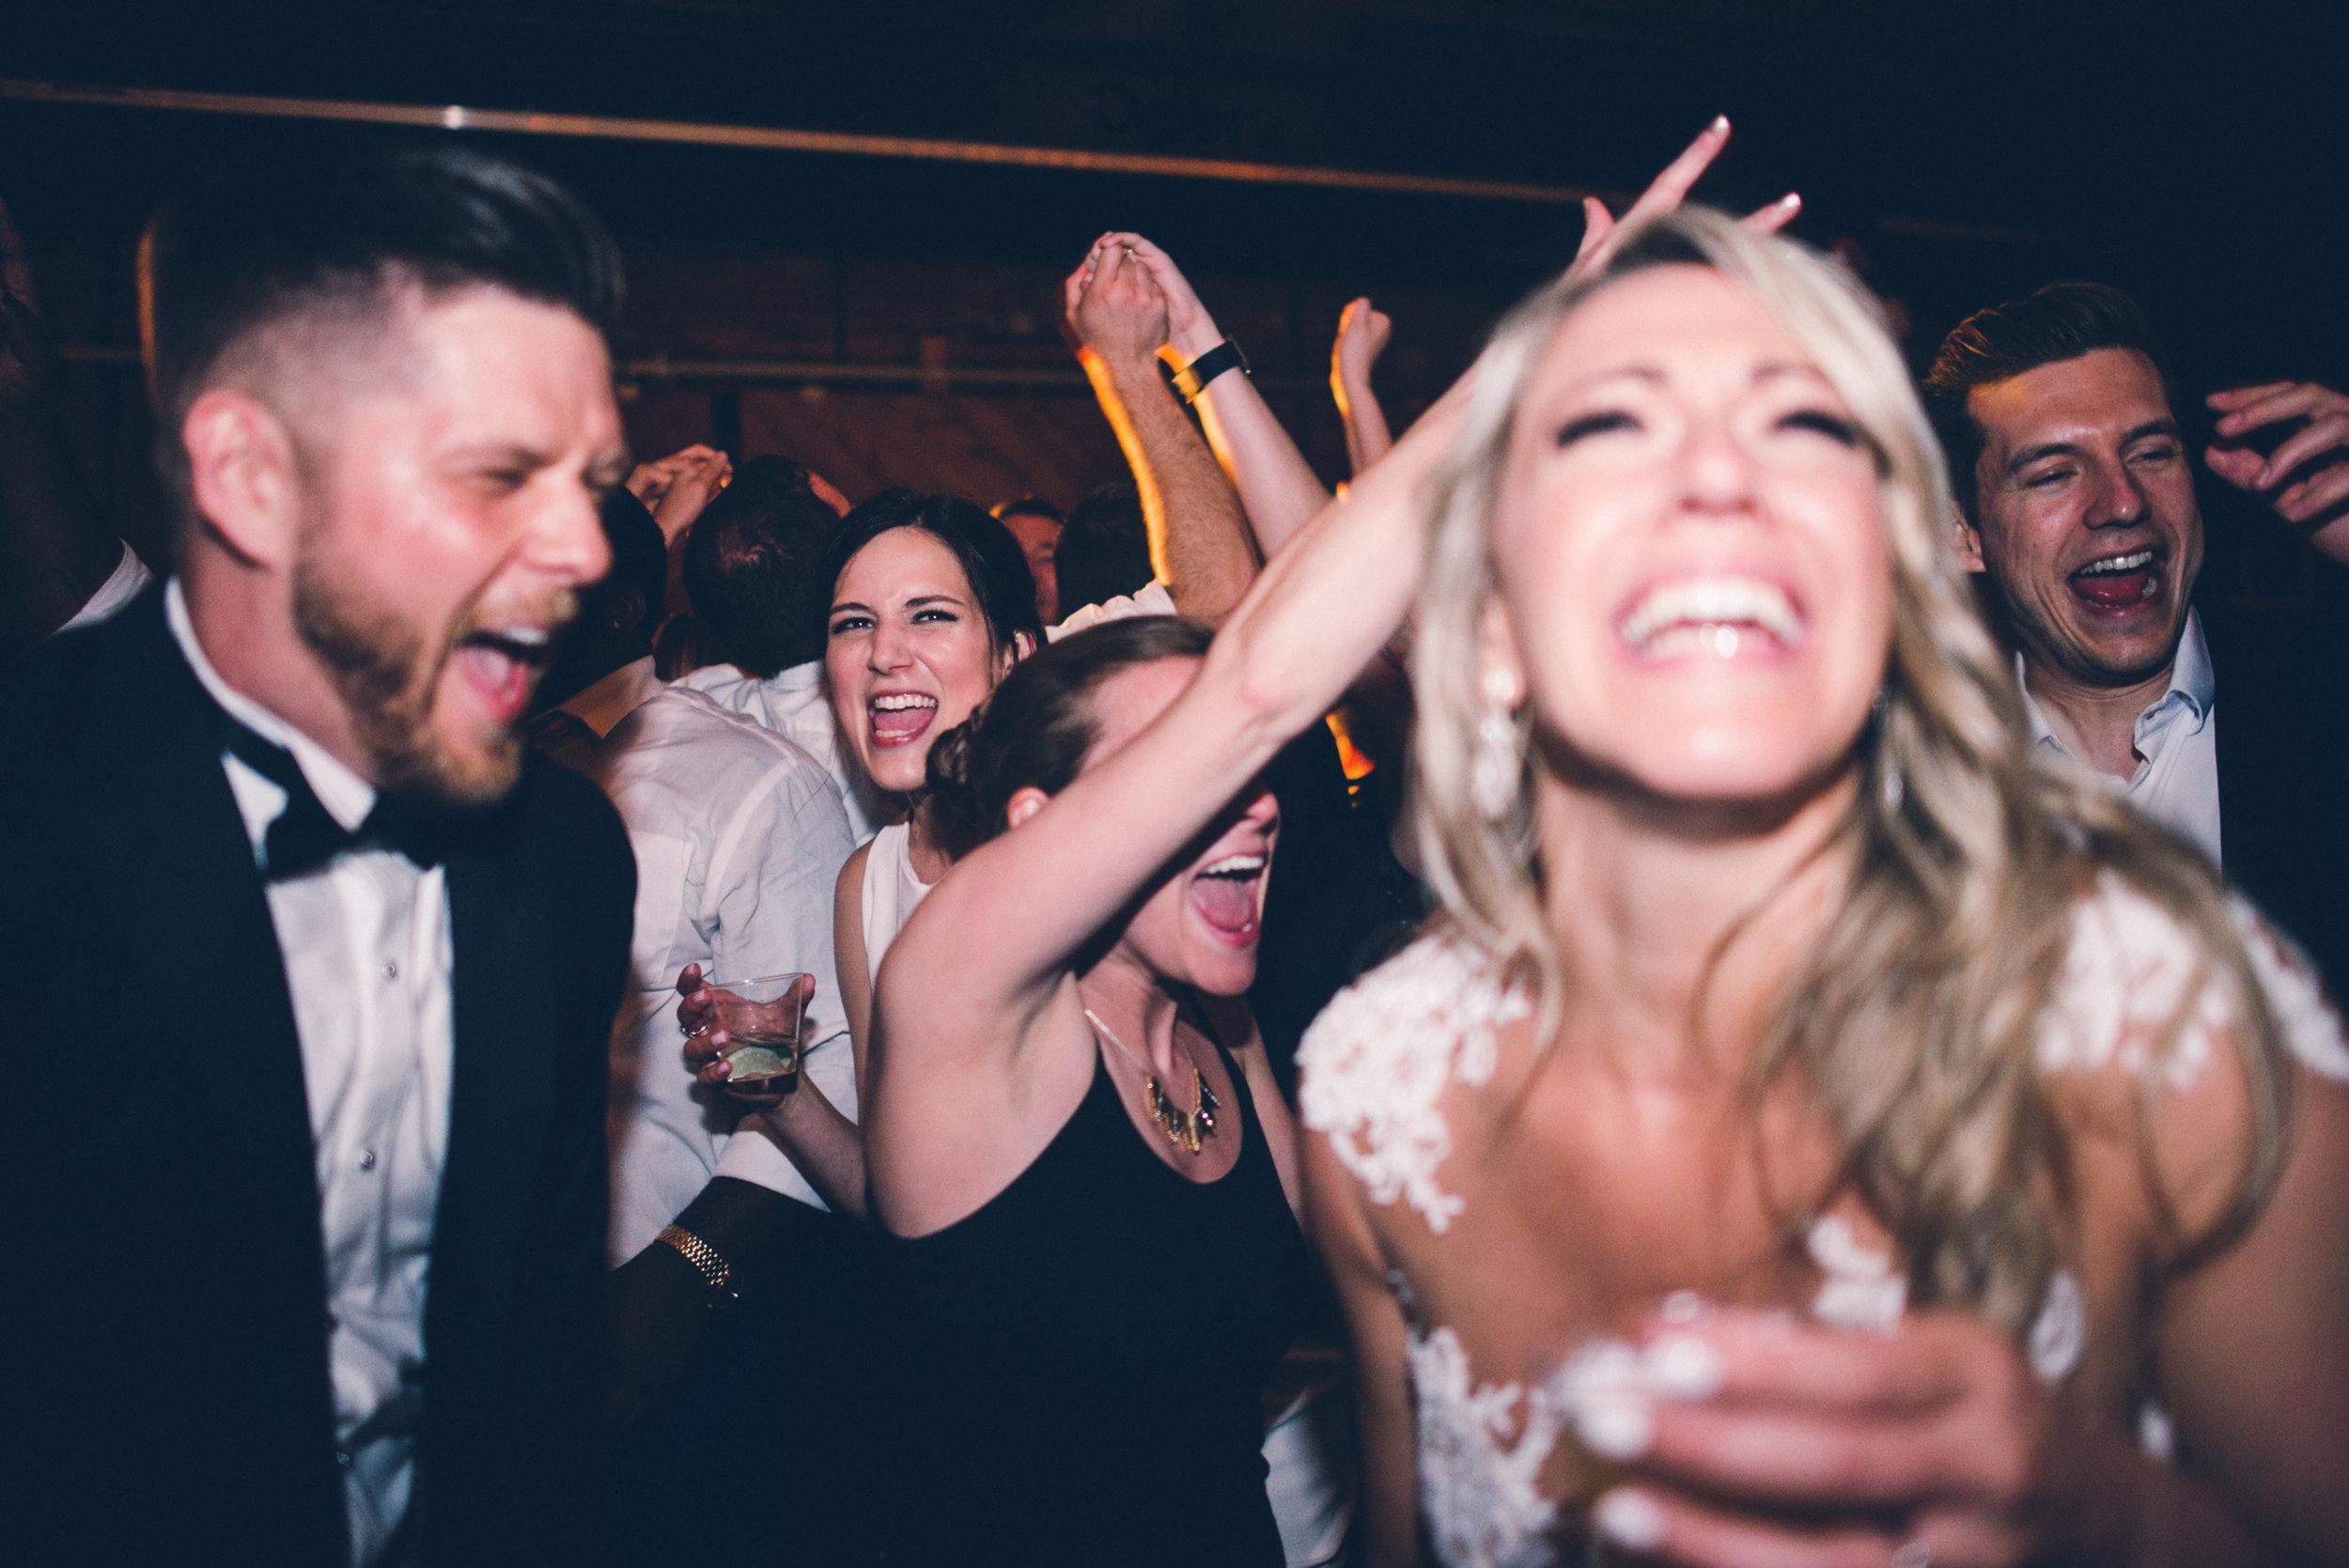 Pittsburgh Pennsylvania New York NYC Wedding Photographer Photojournalist Luxury Downtown Opera - Stirpe 1604.jpg